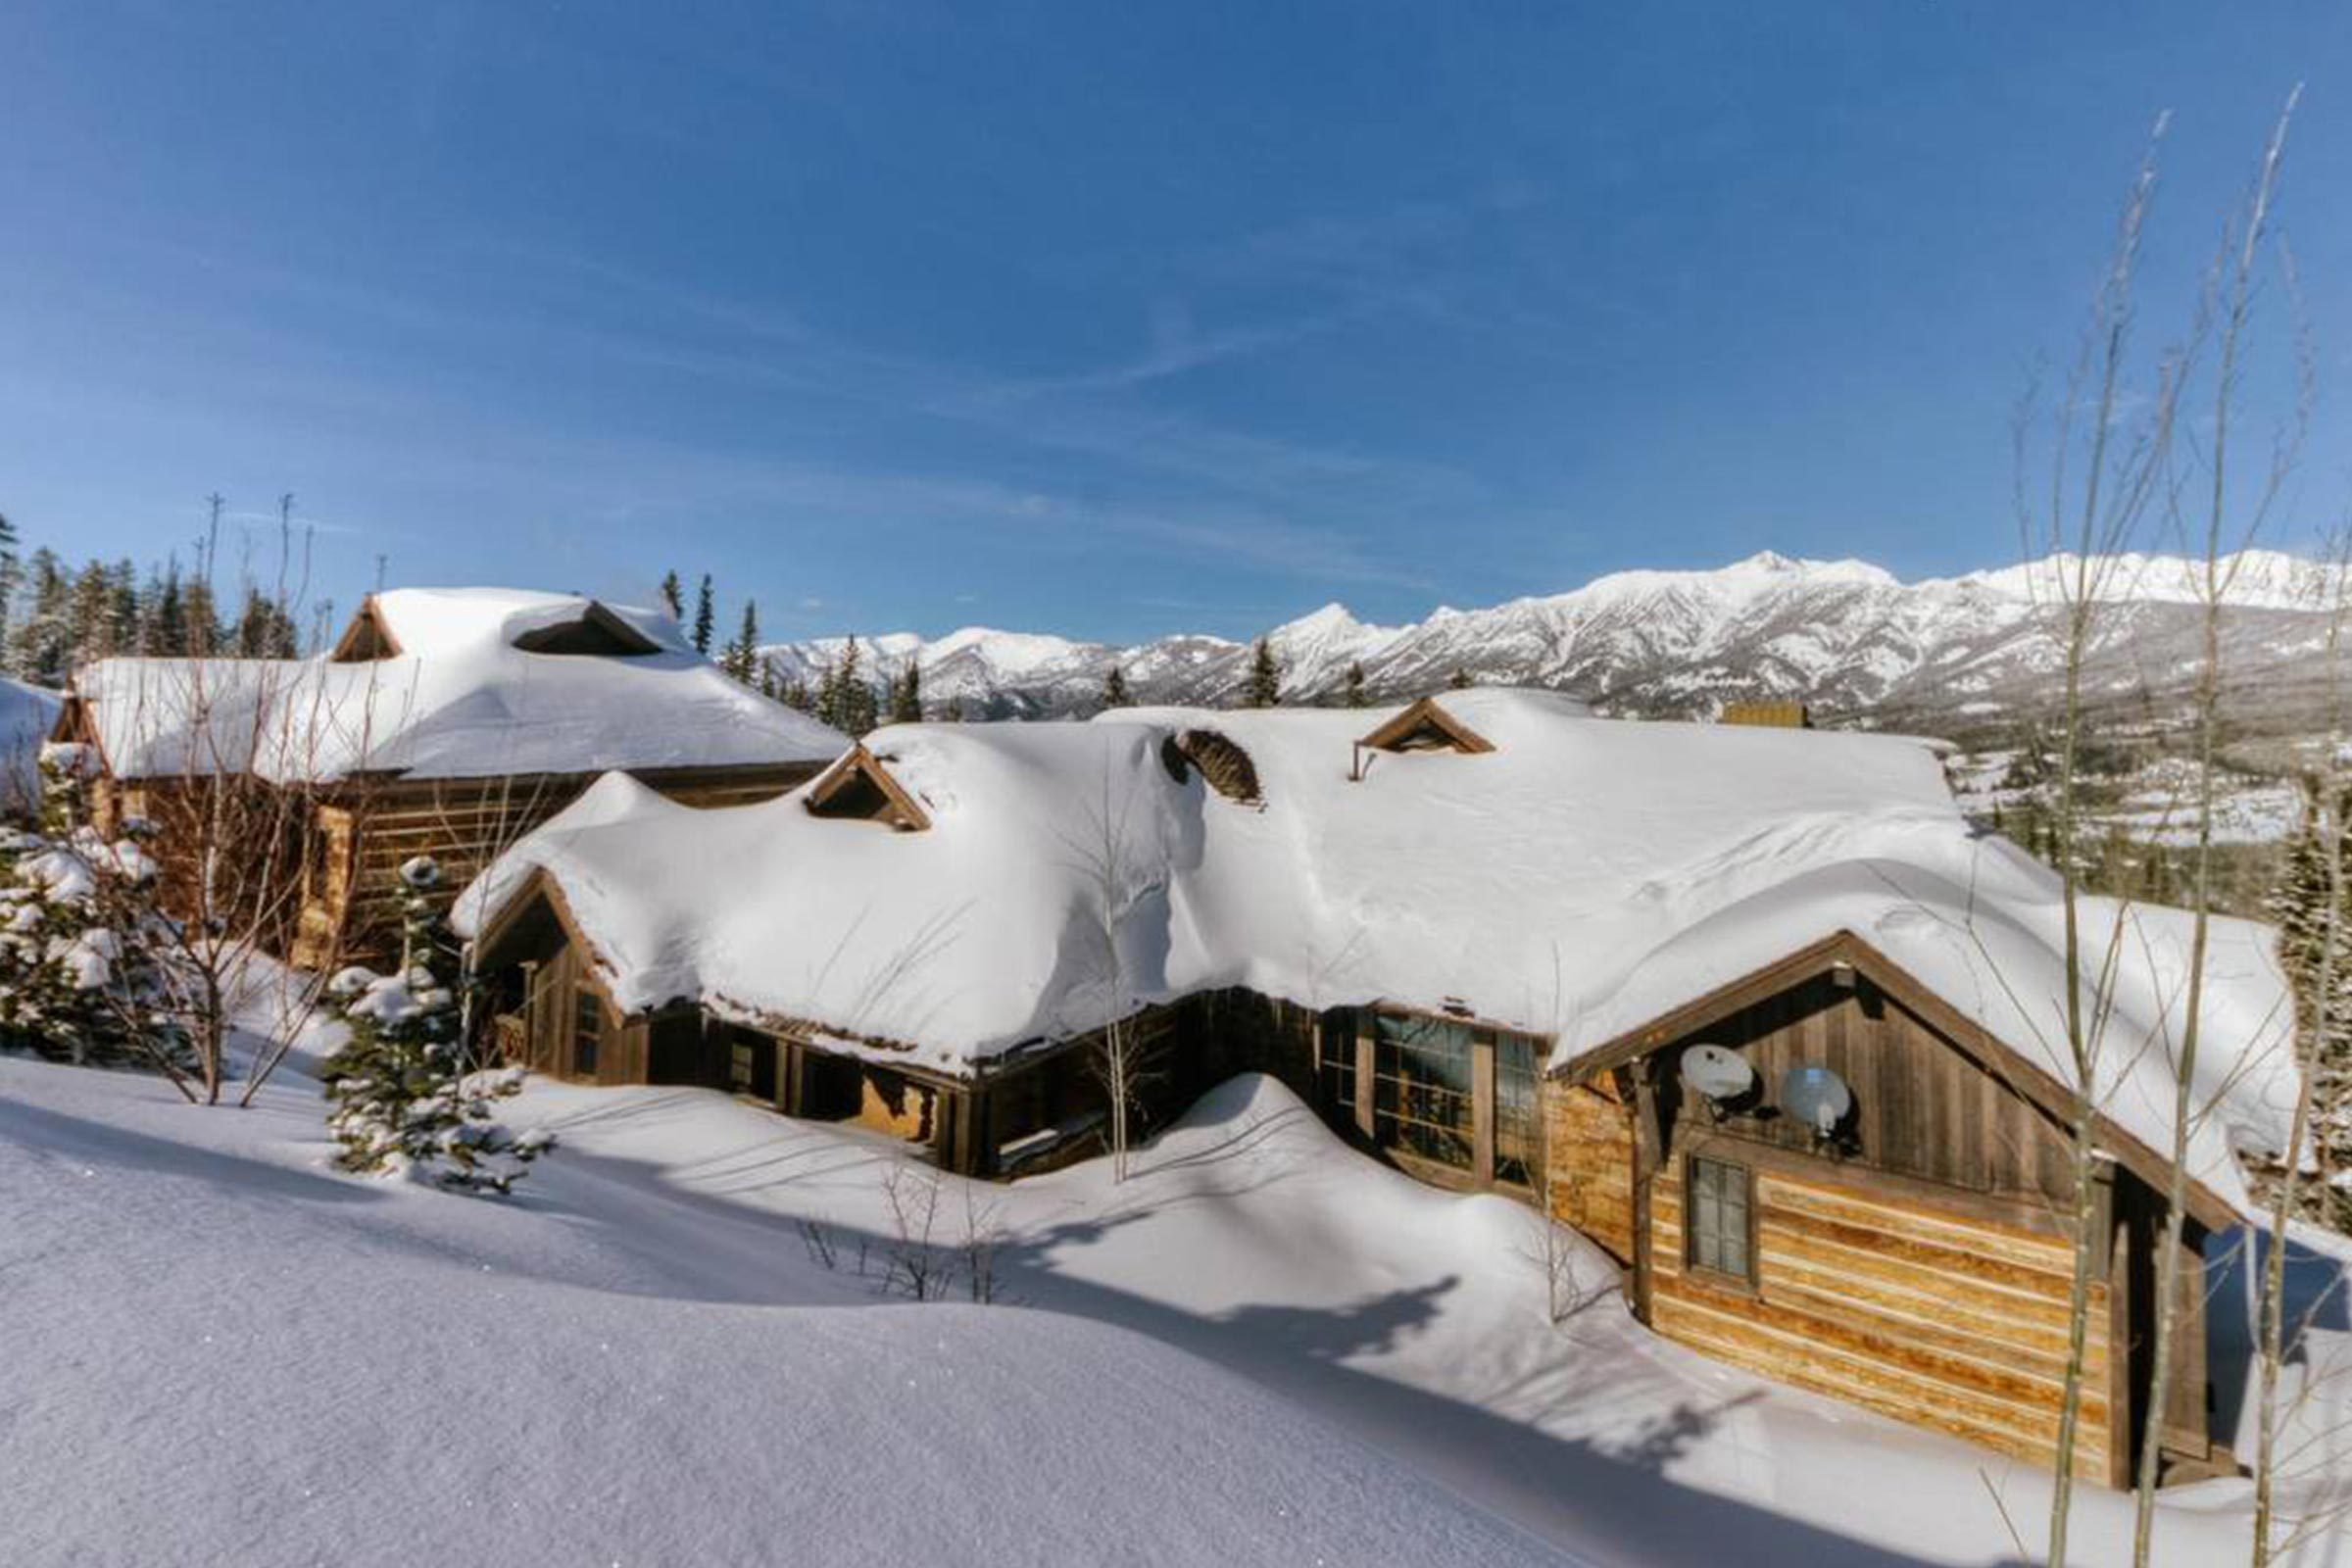 Montana airbnb